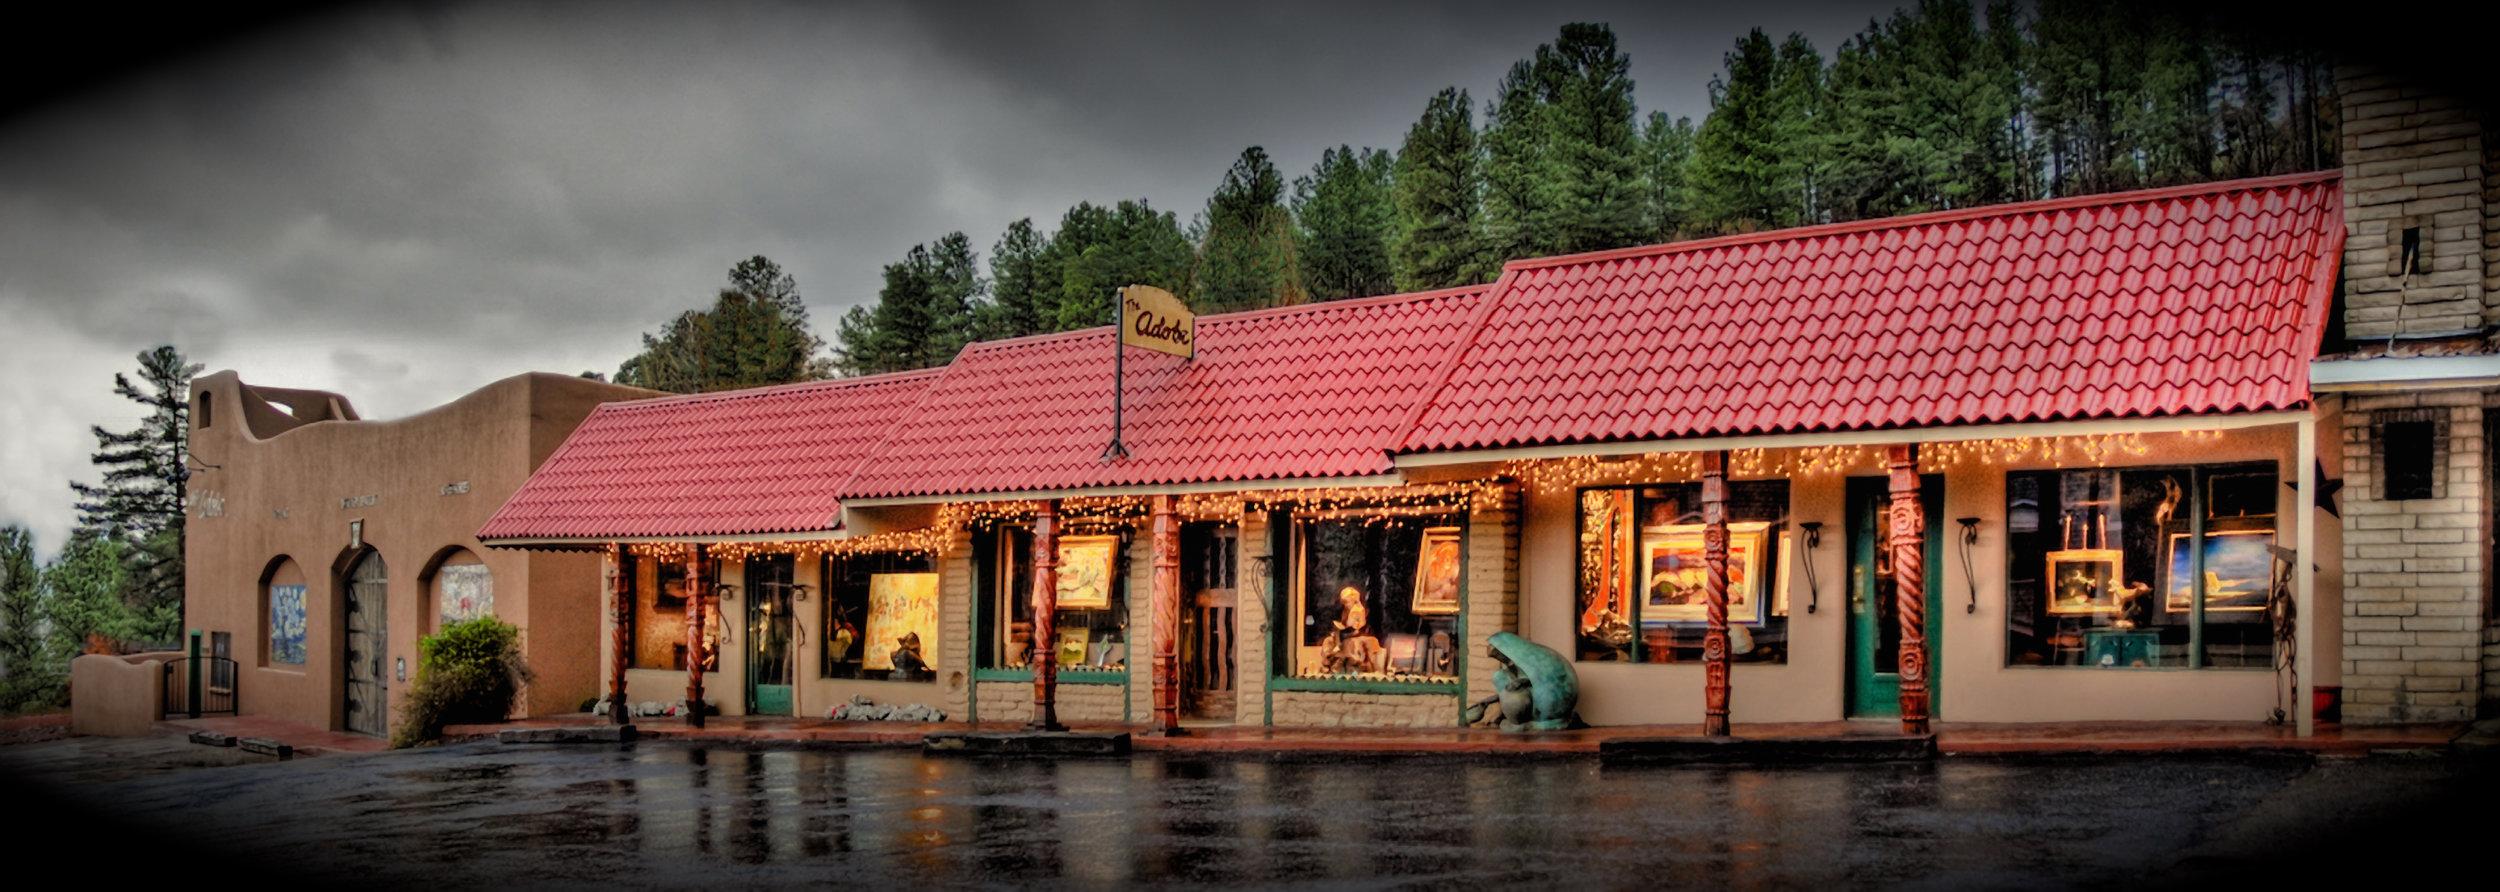 the adobe storefront.jpg